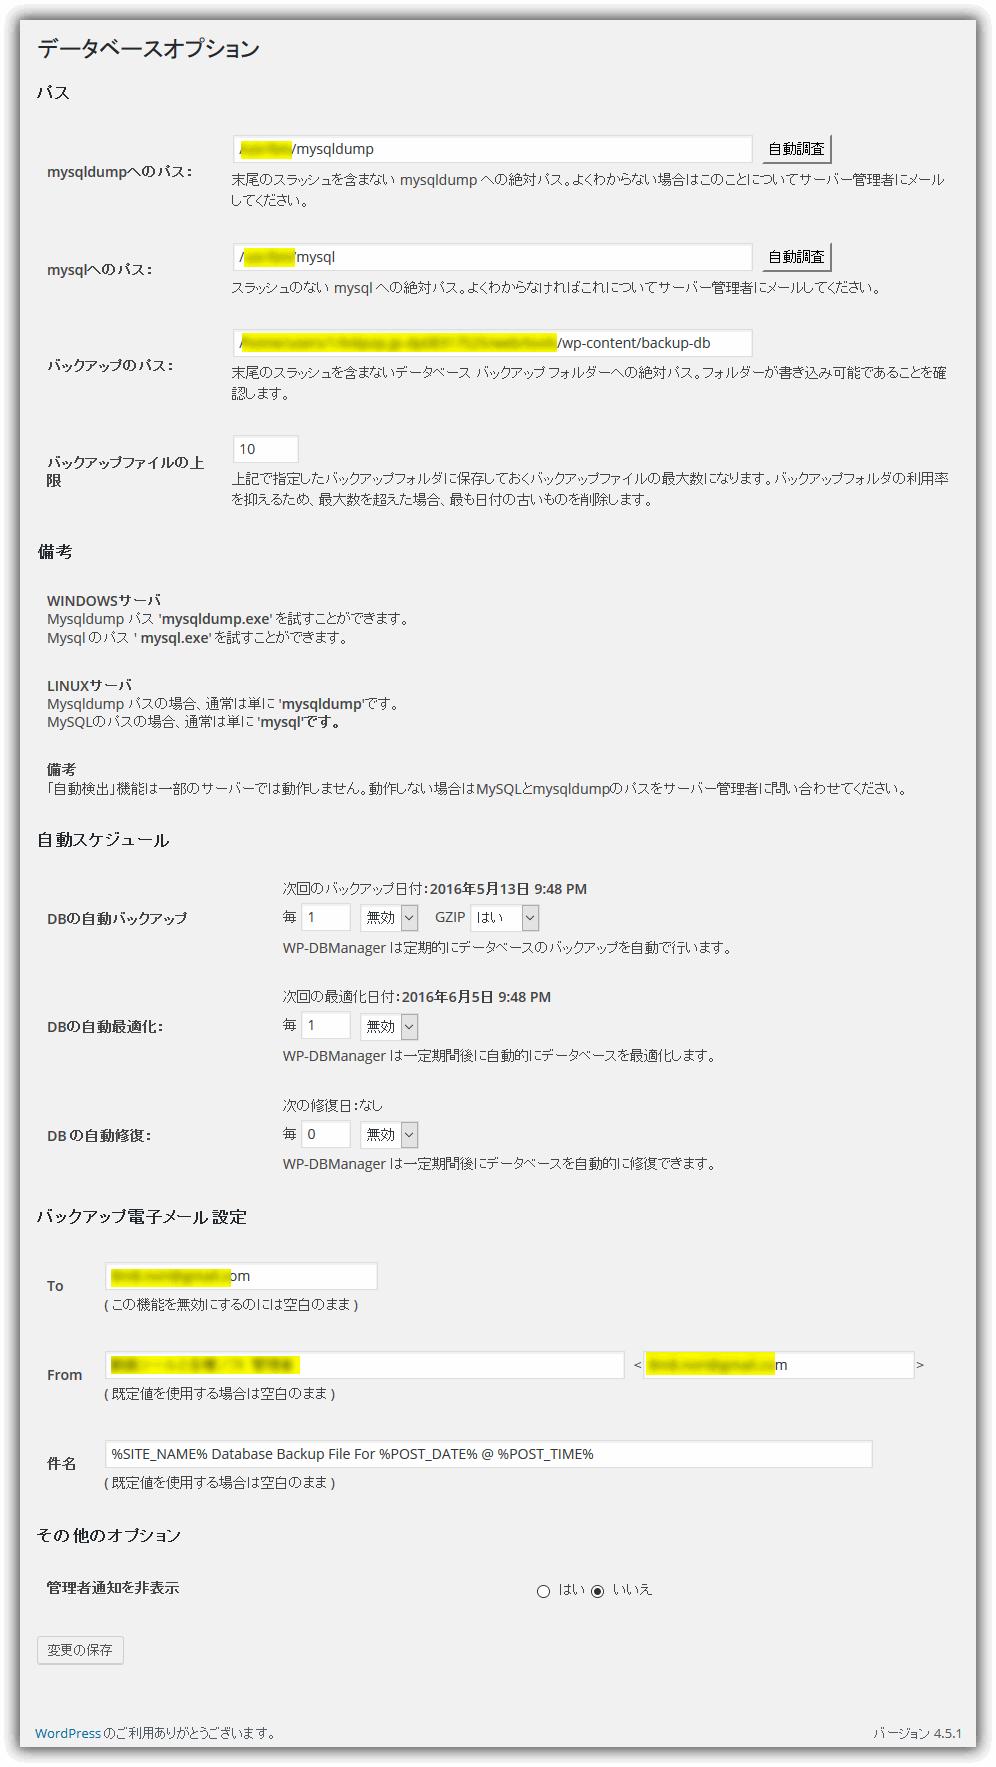 WP-DBManager プラグイン / DBオプション